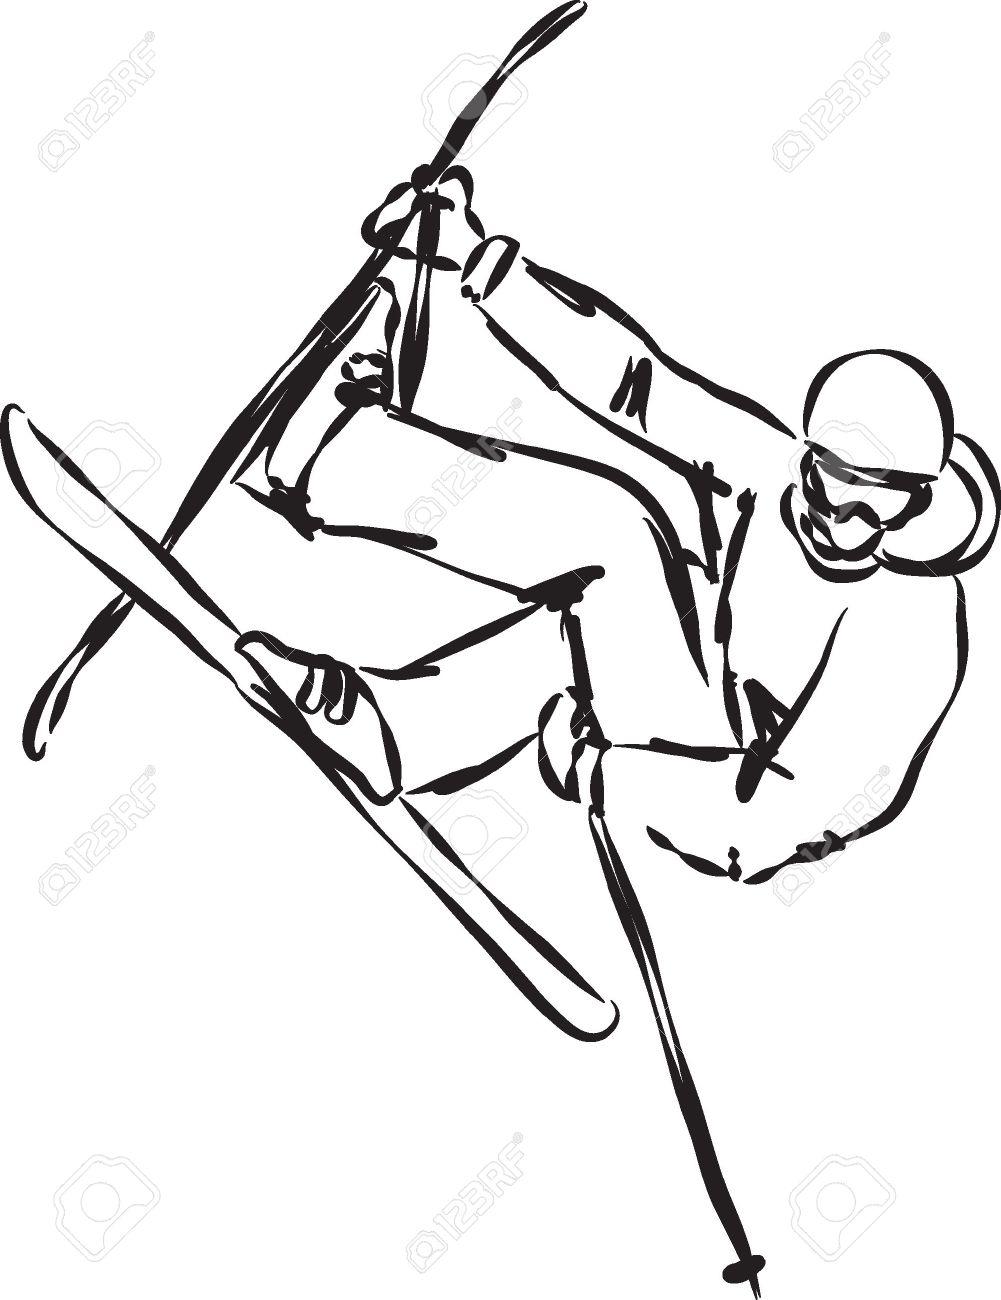 1001x1300 Ski Jump Illustration 2 Royalty Free Cliparts, Vectors, And Stock